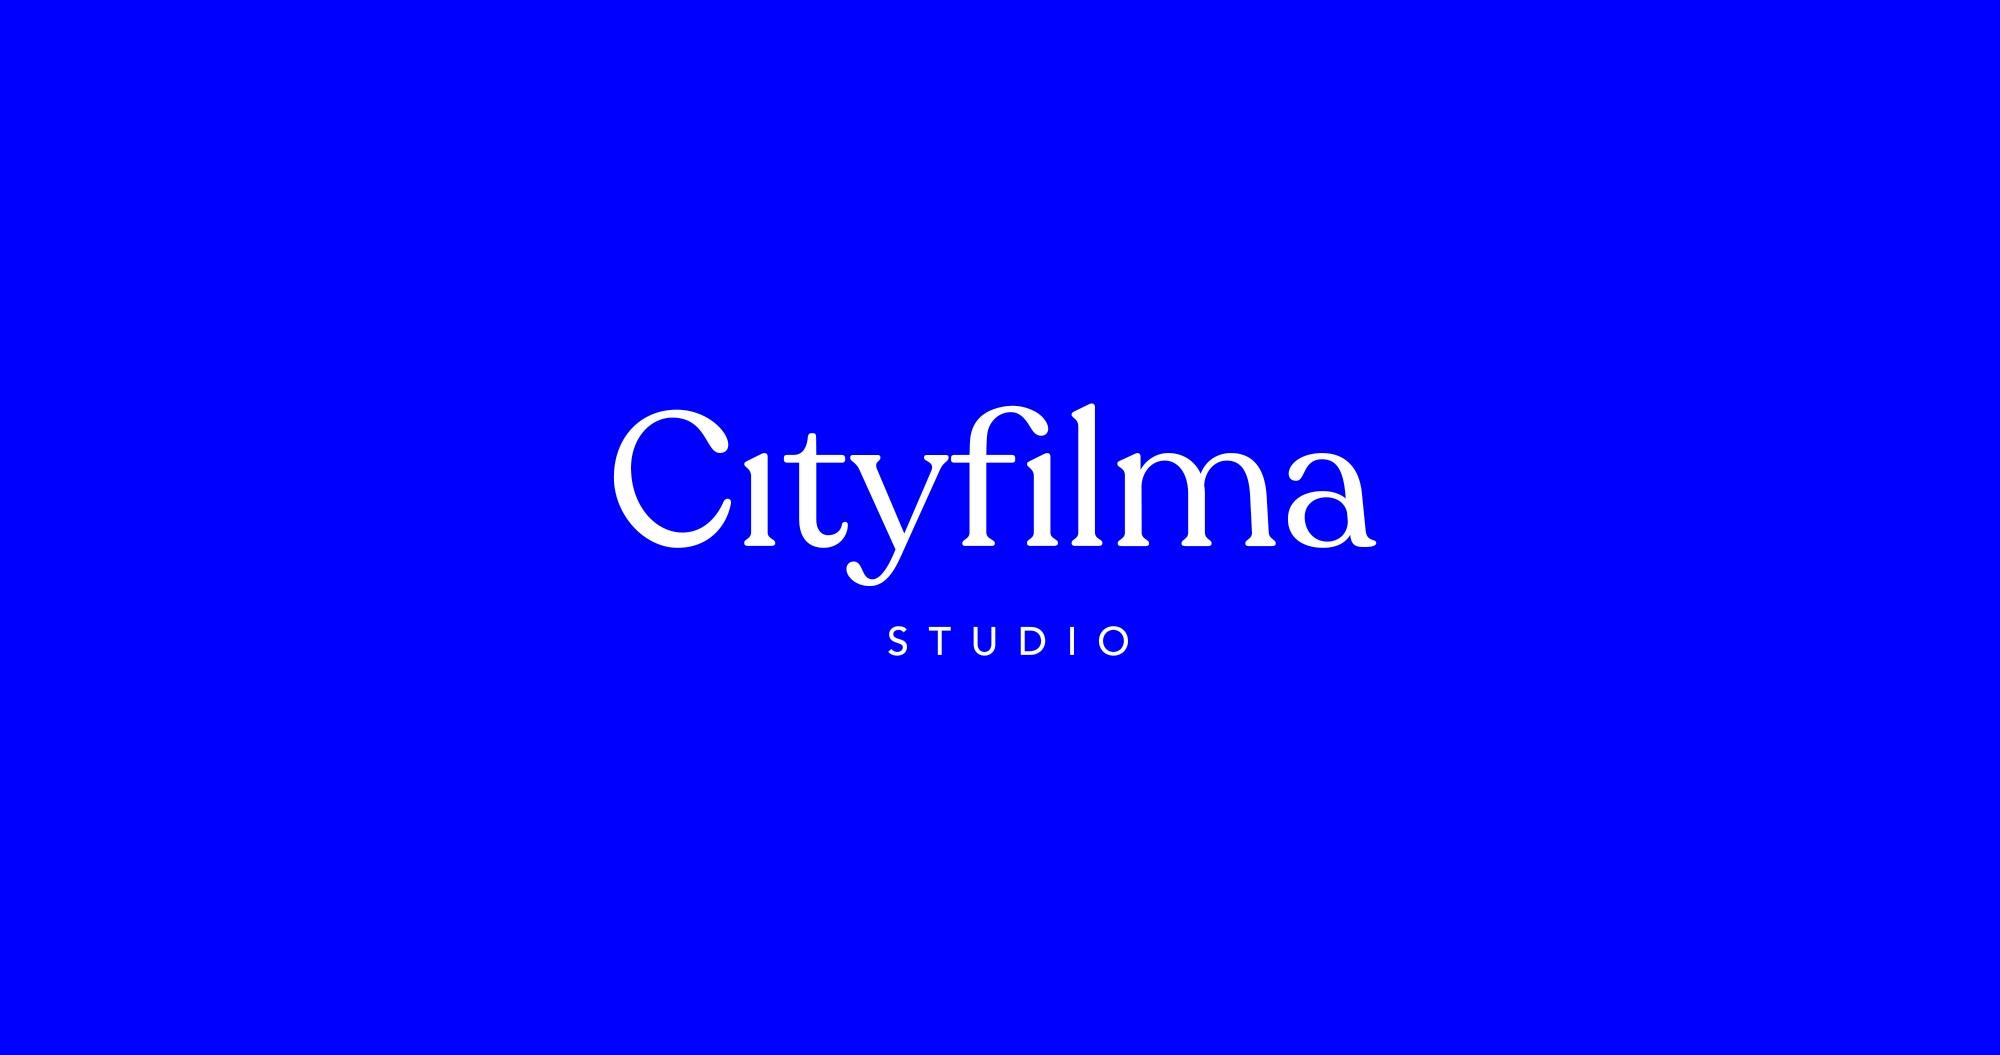 cityfilma_estelalcaraz_01